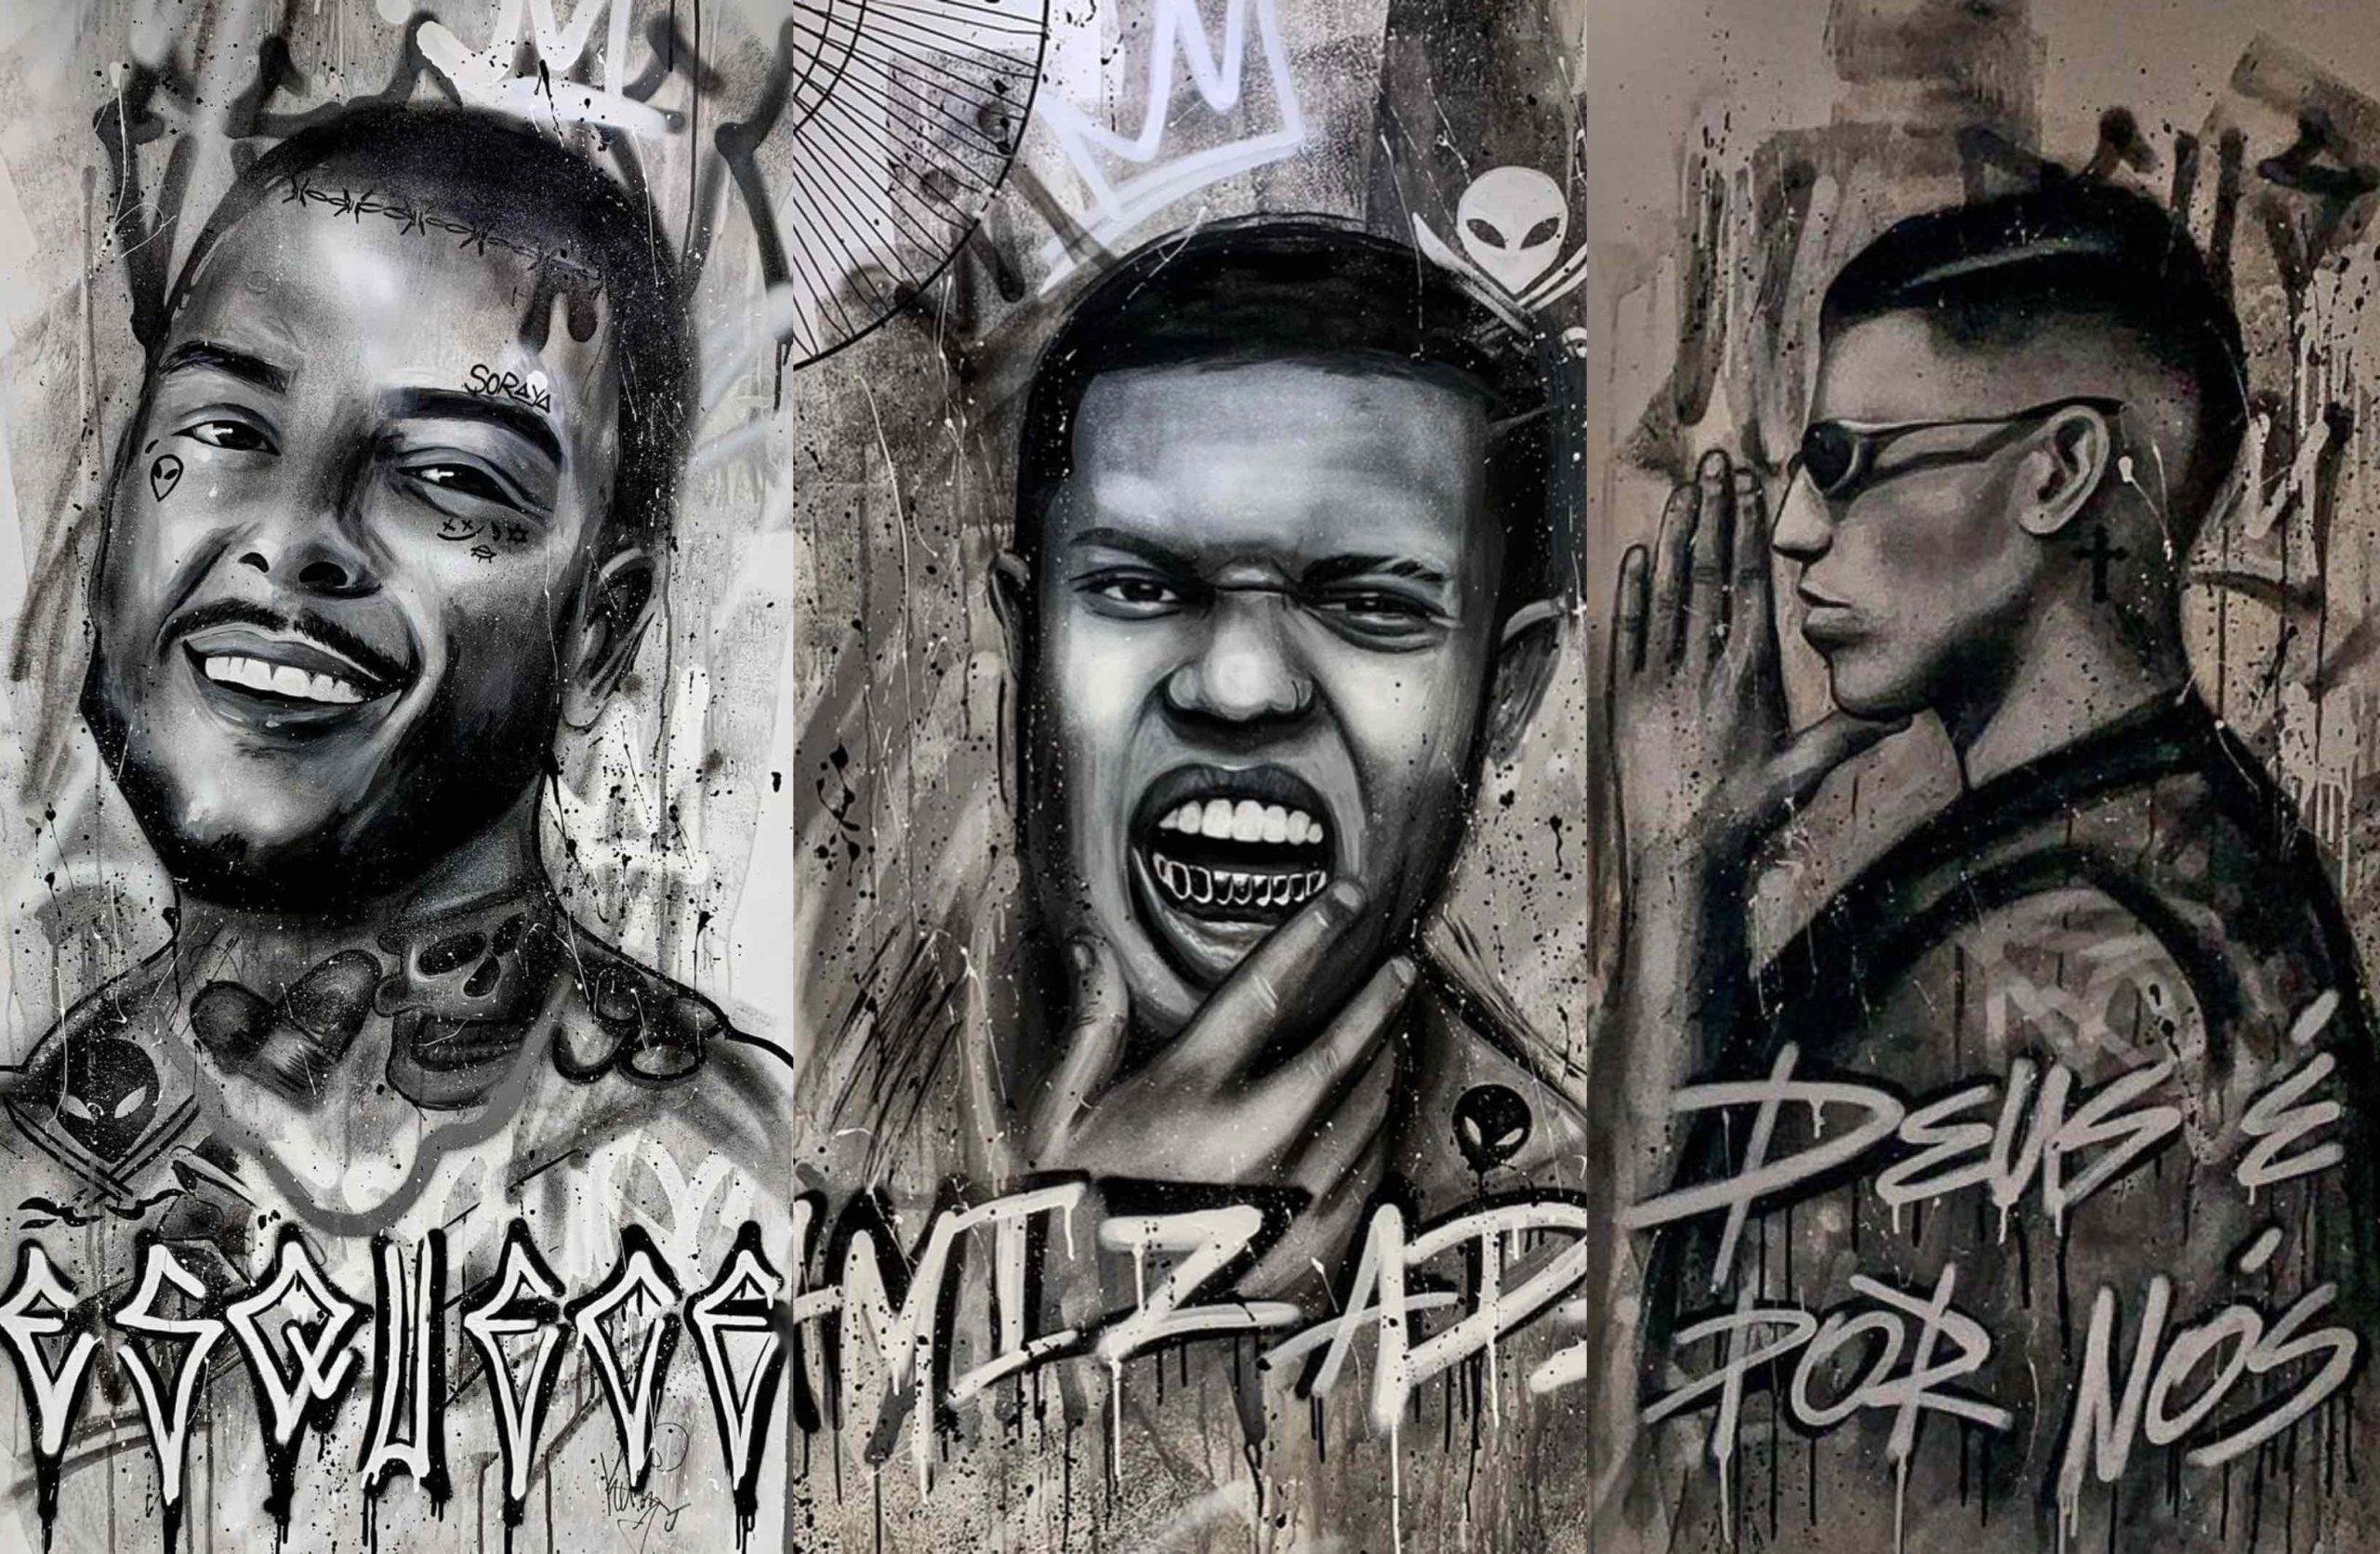 Grafite dos MC's na Mansão Maromba: Juliana Fochesato surpreendeu Lan, Marks e Kevin pelos traços idênticos